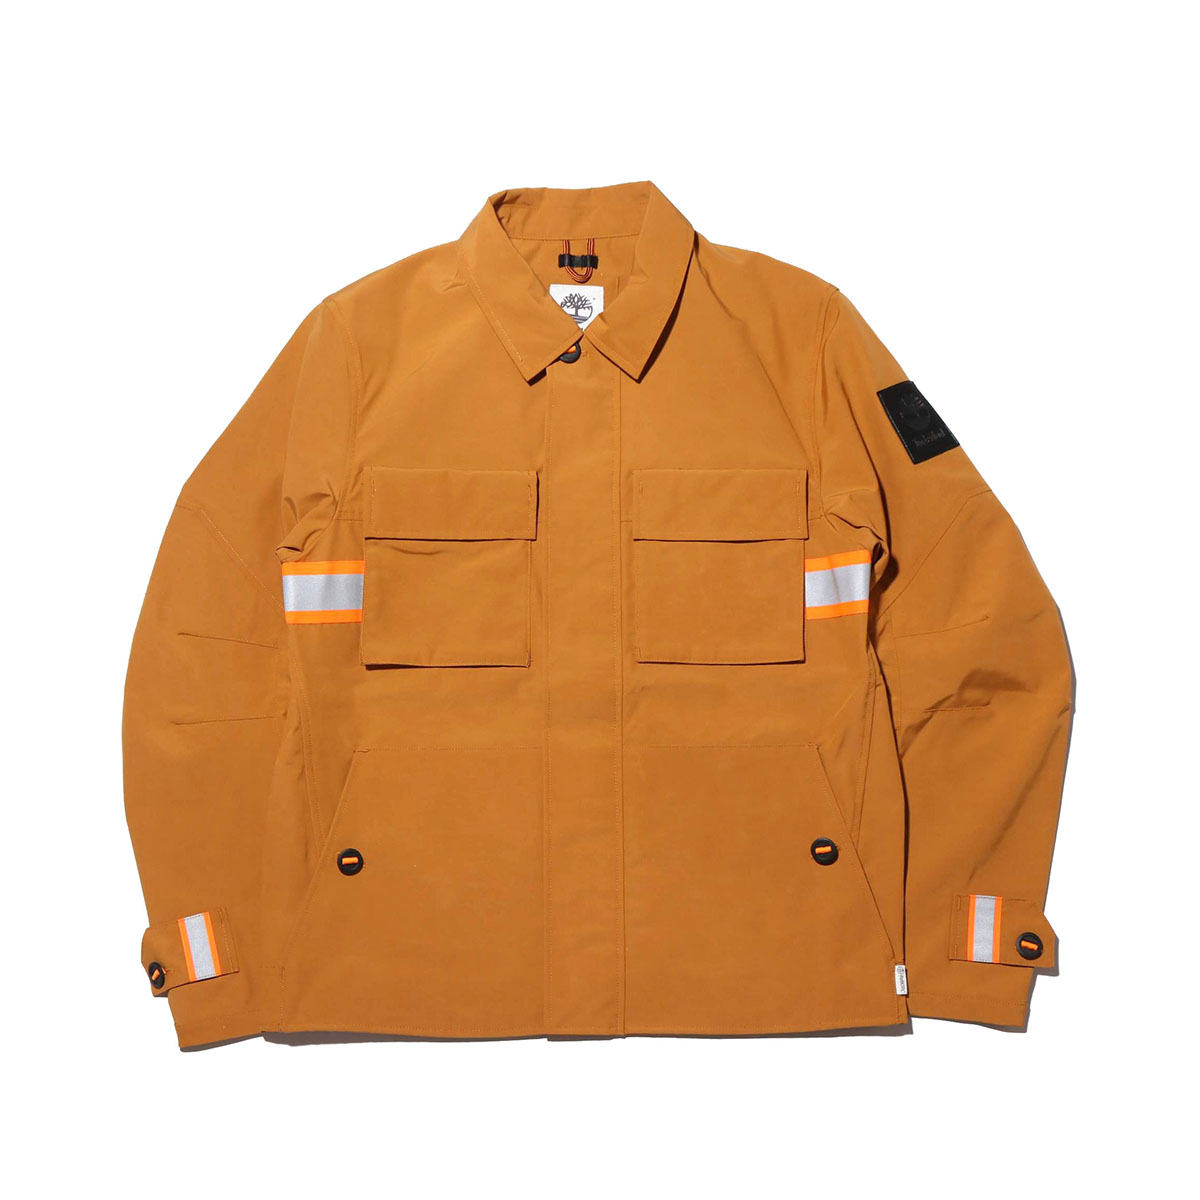 Timberland AF Worker Jacket(Wheat)(ティバンーランド AF ワーカージャケット)【メンズ】【ジャケット】【20SS-S】